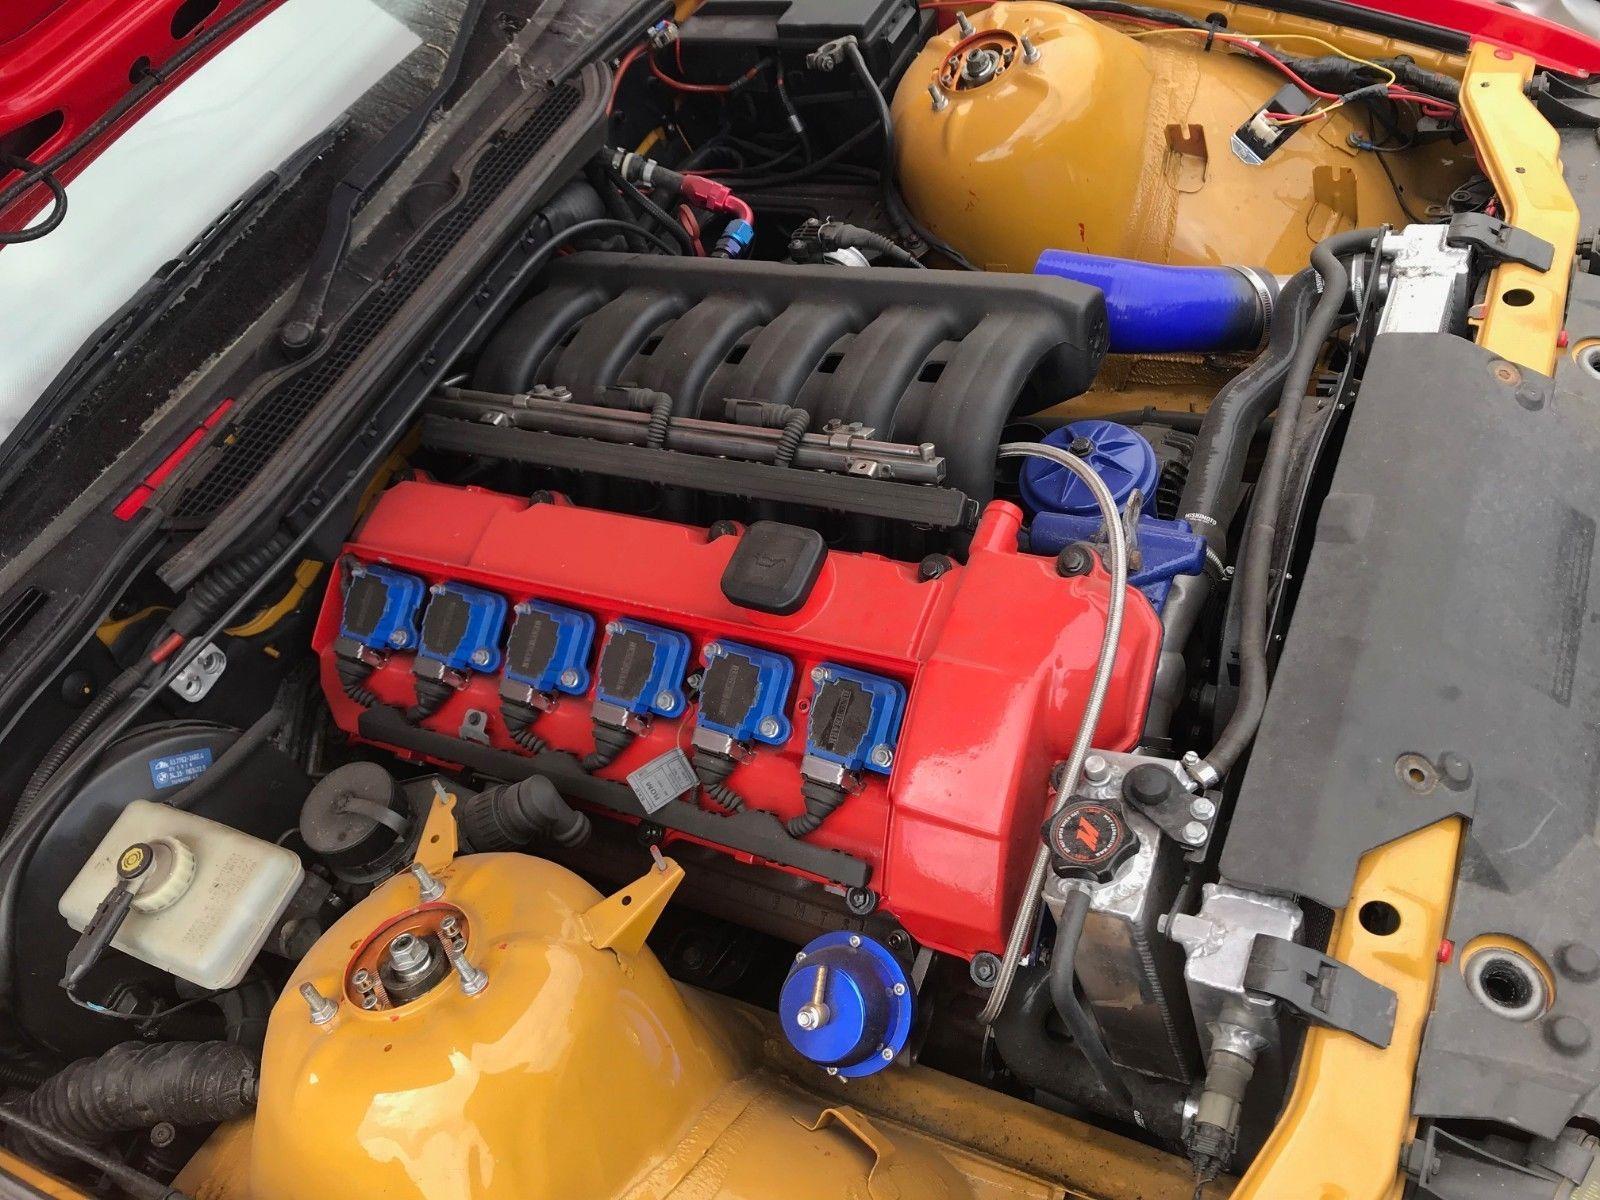 Ebay Bmw E36 Compact 328 Turbo Project M52 2 8 Track Drift Car